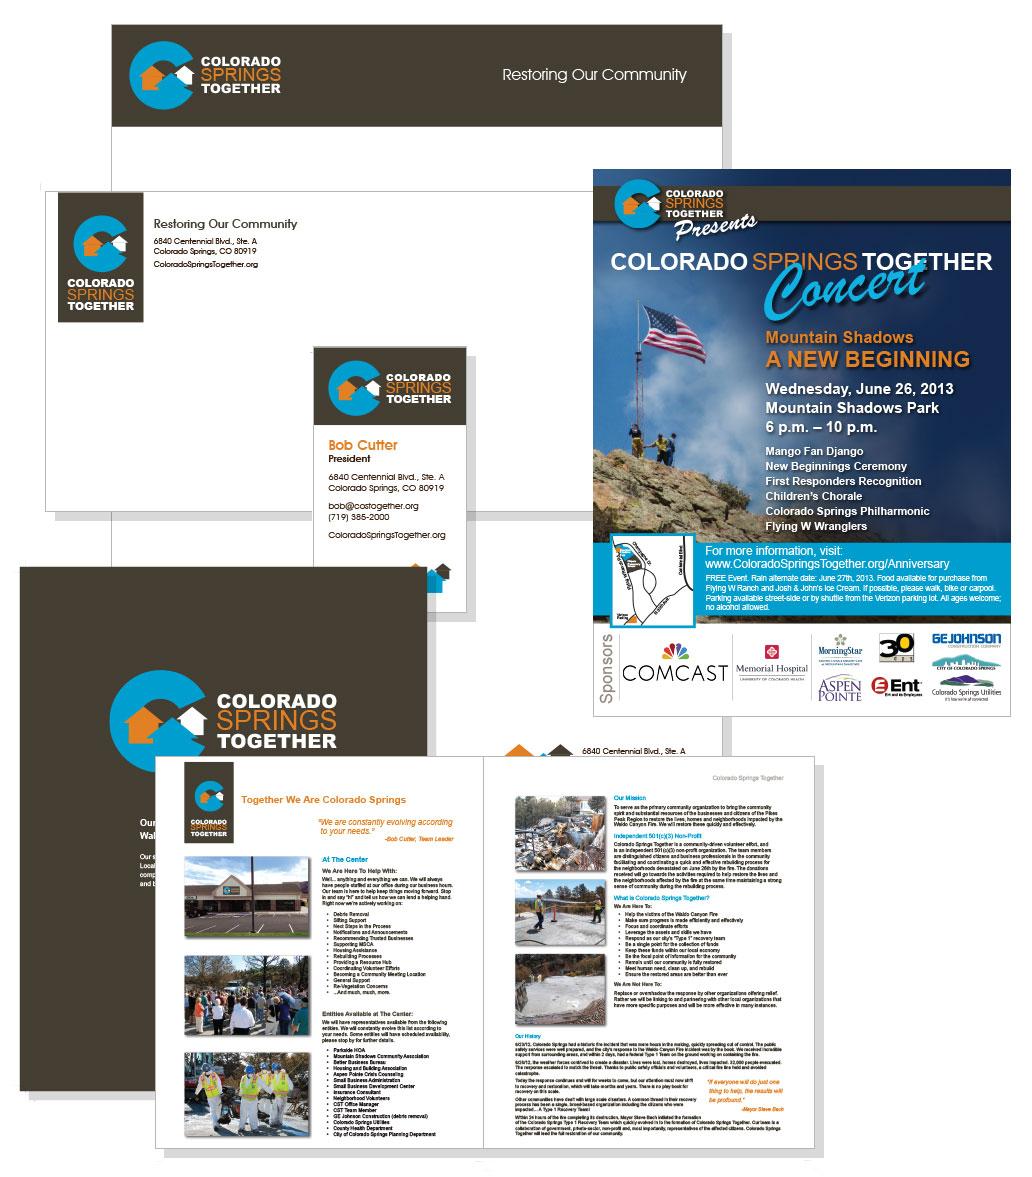 Colorado Springs Together Webpage Design Examples